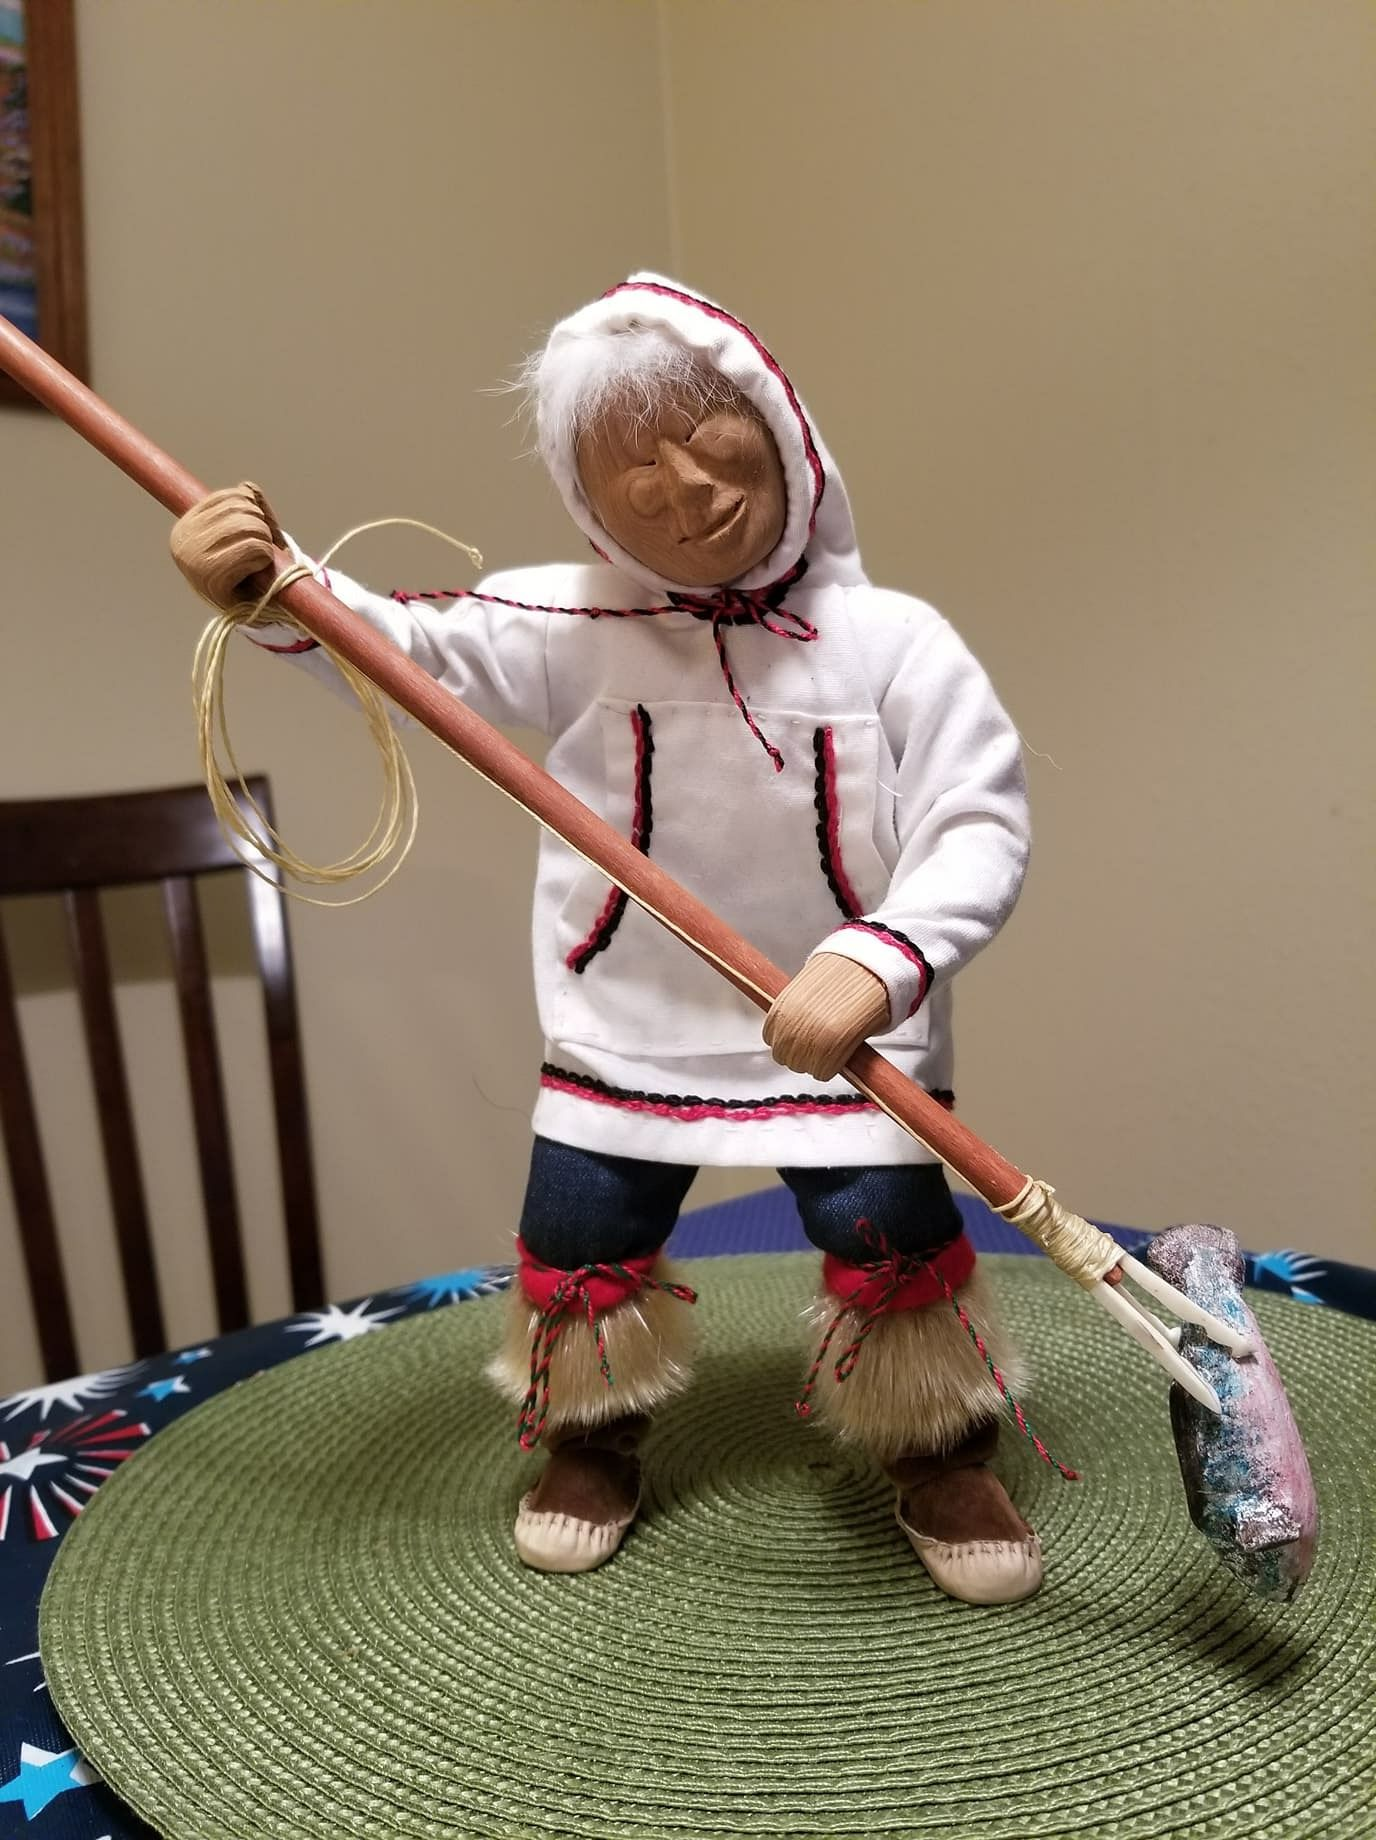 Pin By Debra Conlon On Inuit Dolls Native American Dolls Barbie Dolls Art Dolls